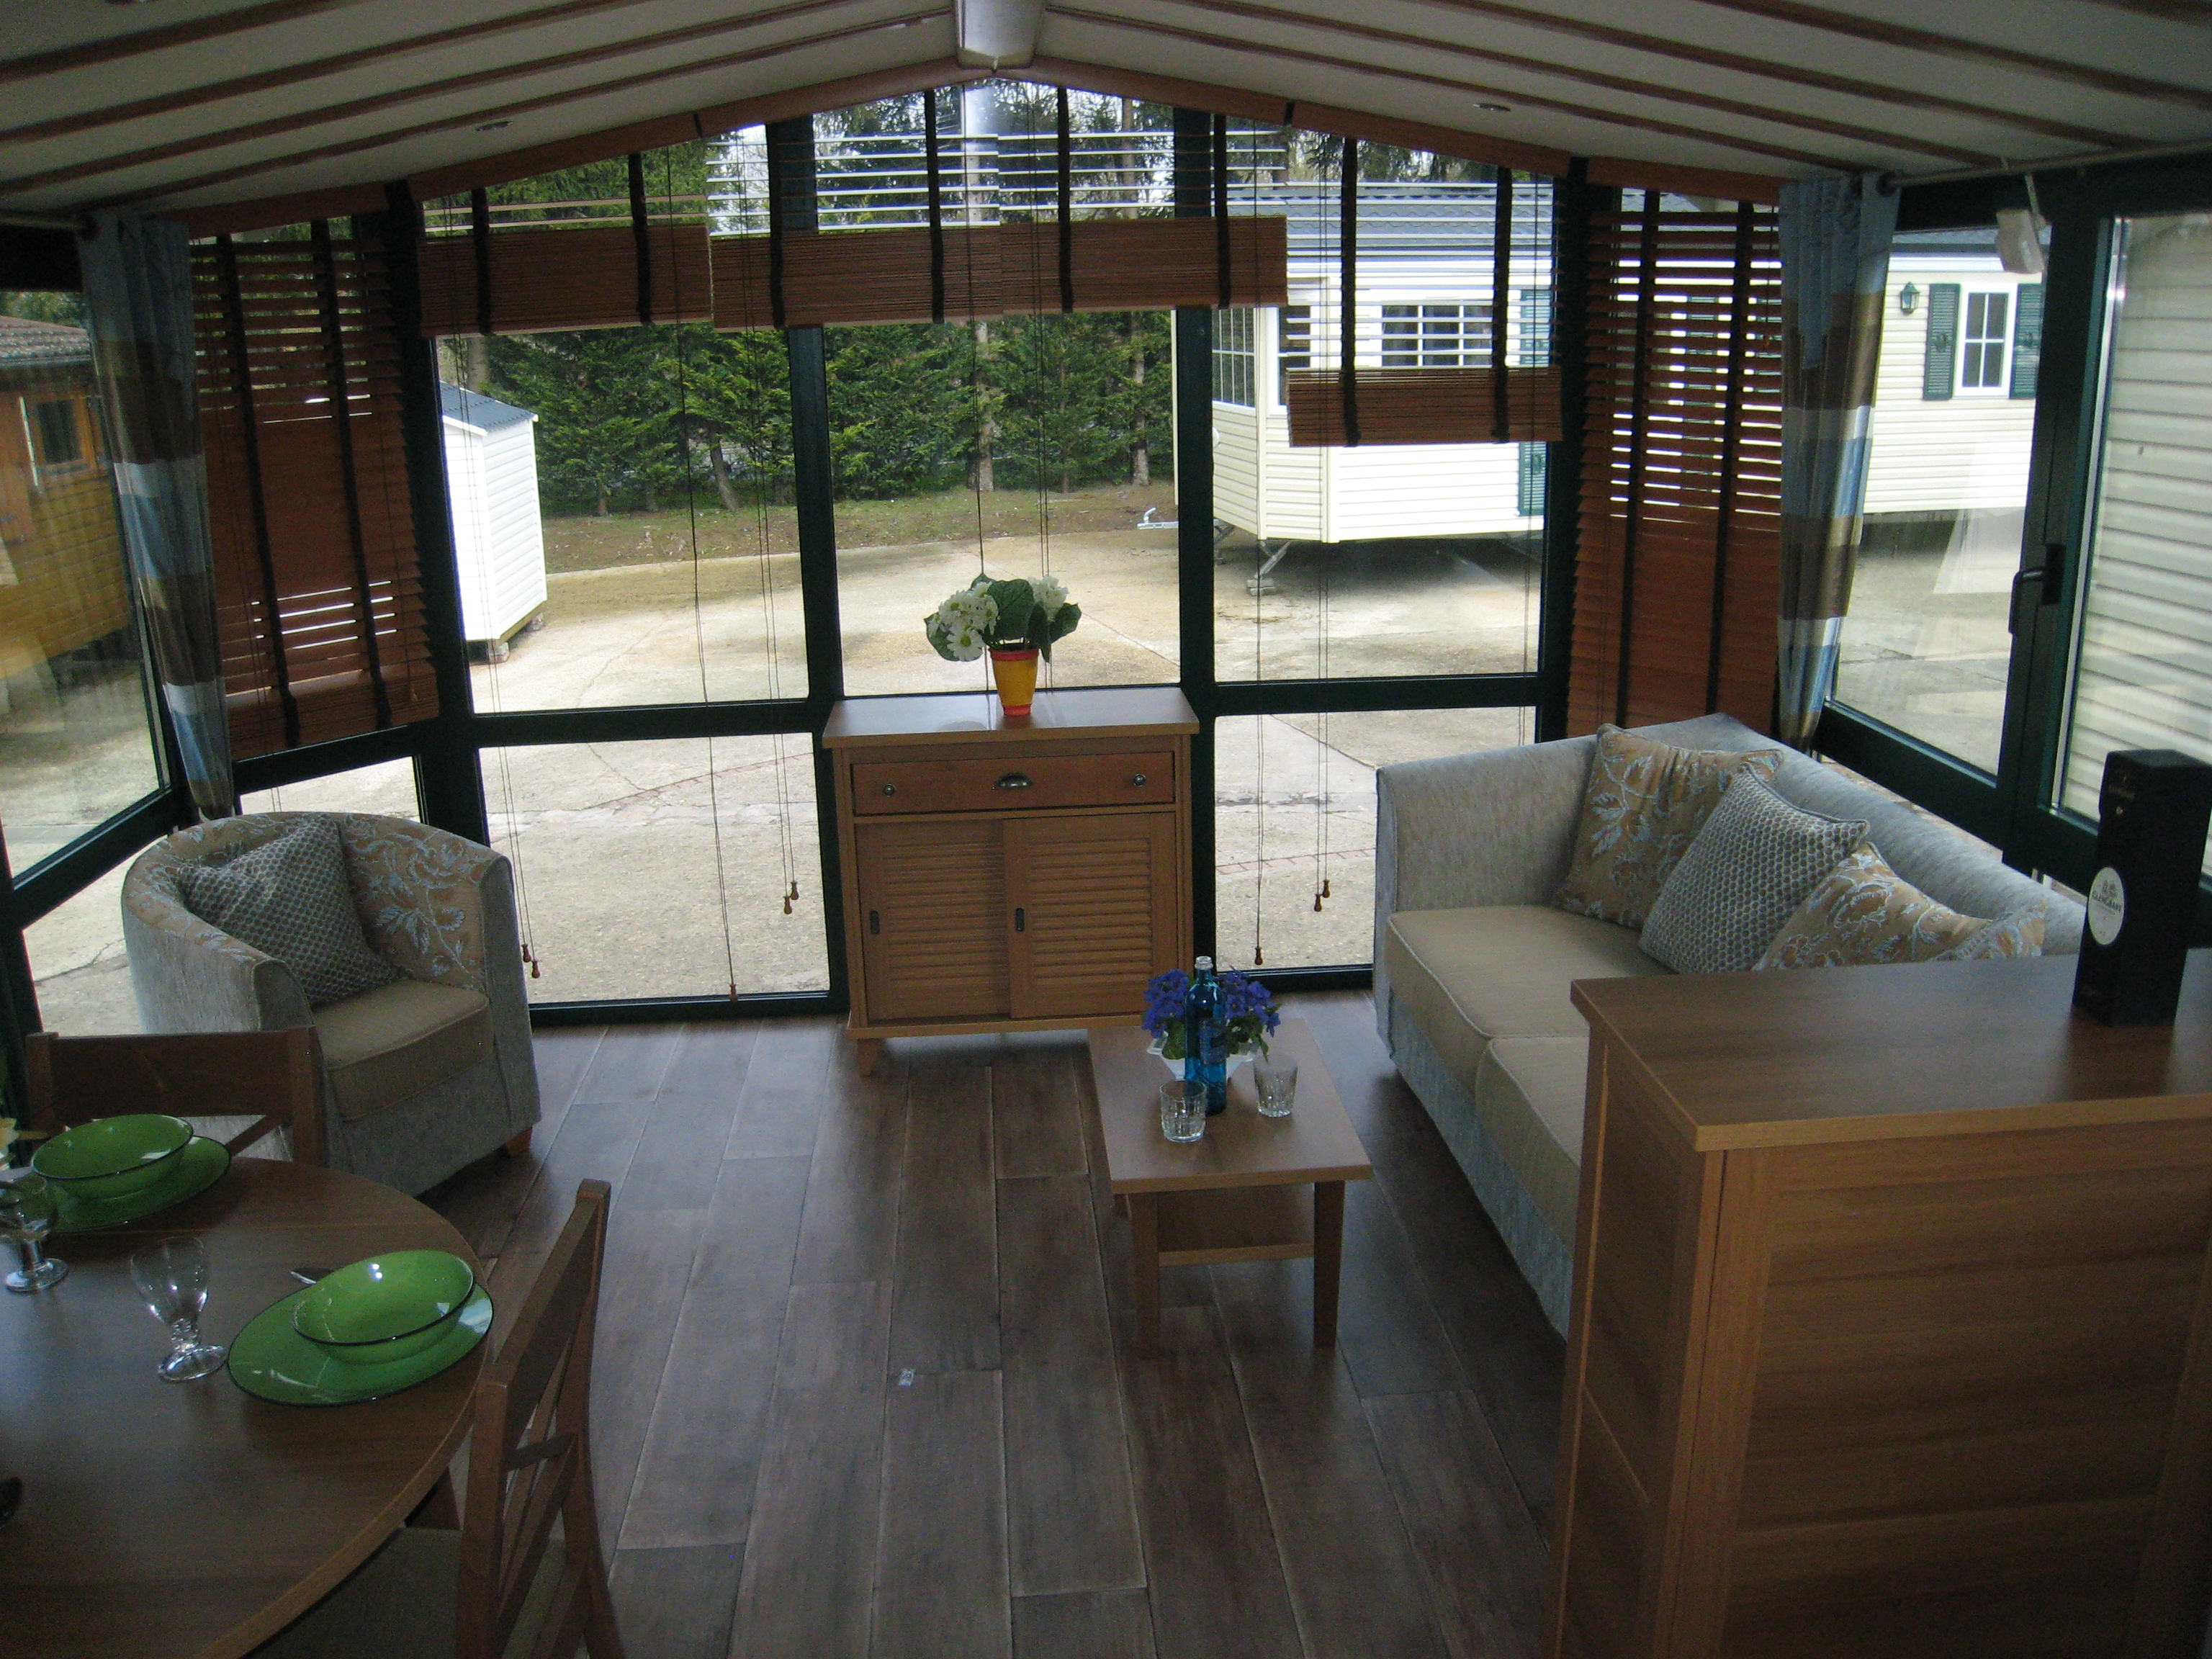 rapidhome select 109 neuf mobil home vendre en oise 60 ref 1304 net campers. Black Bedroom Furniture Sets. Home Design Ideas